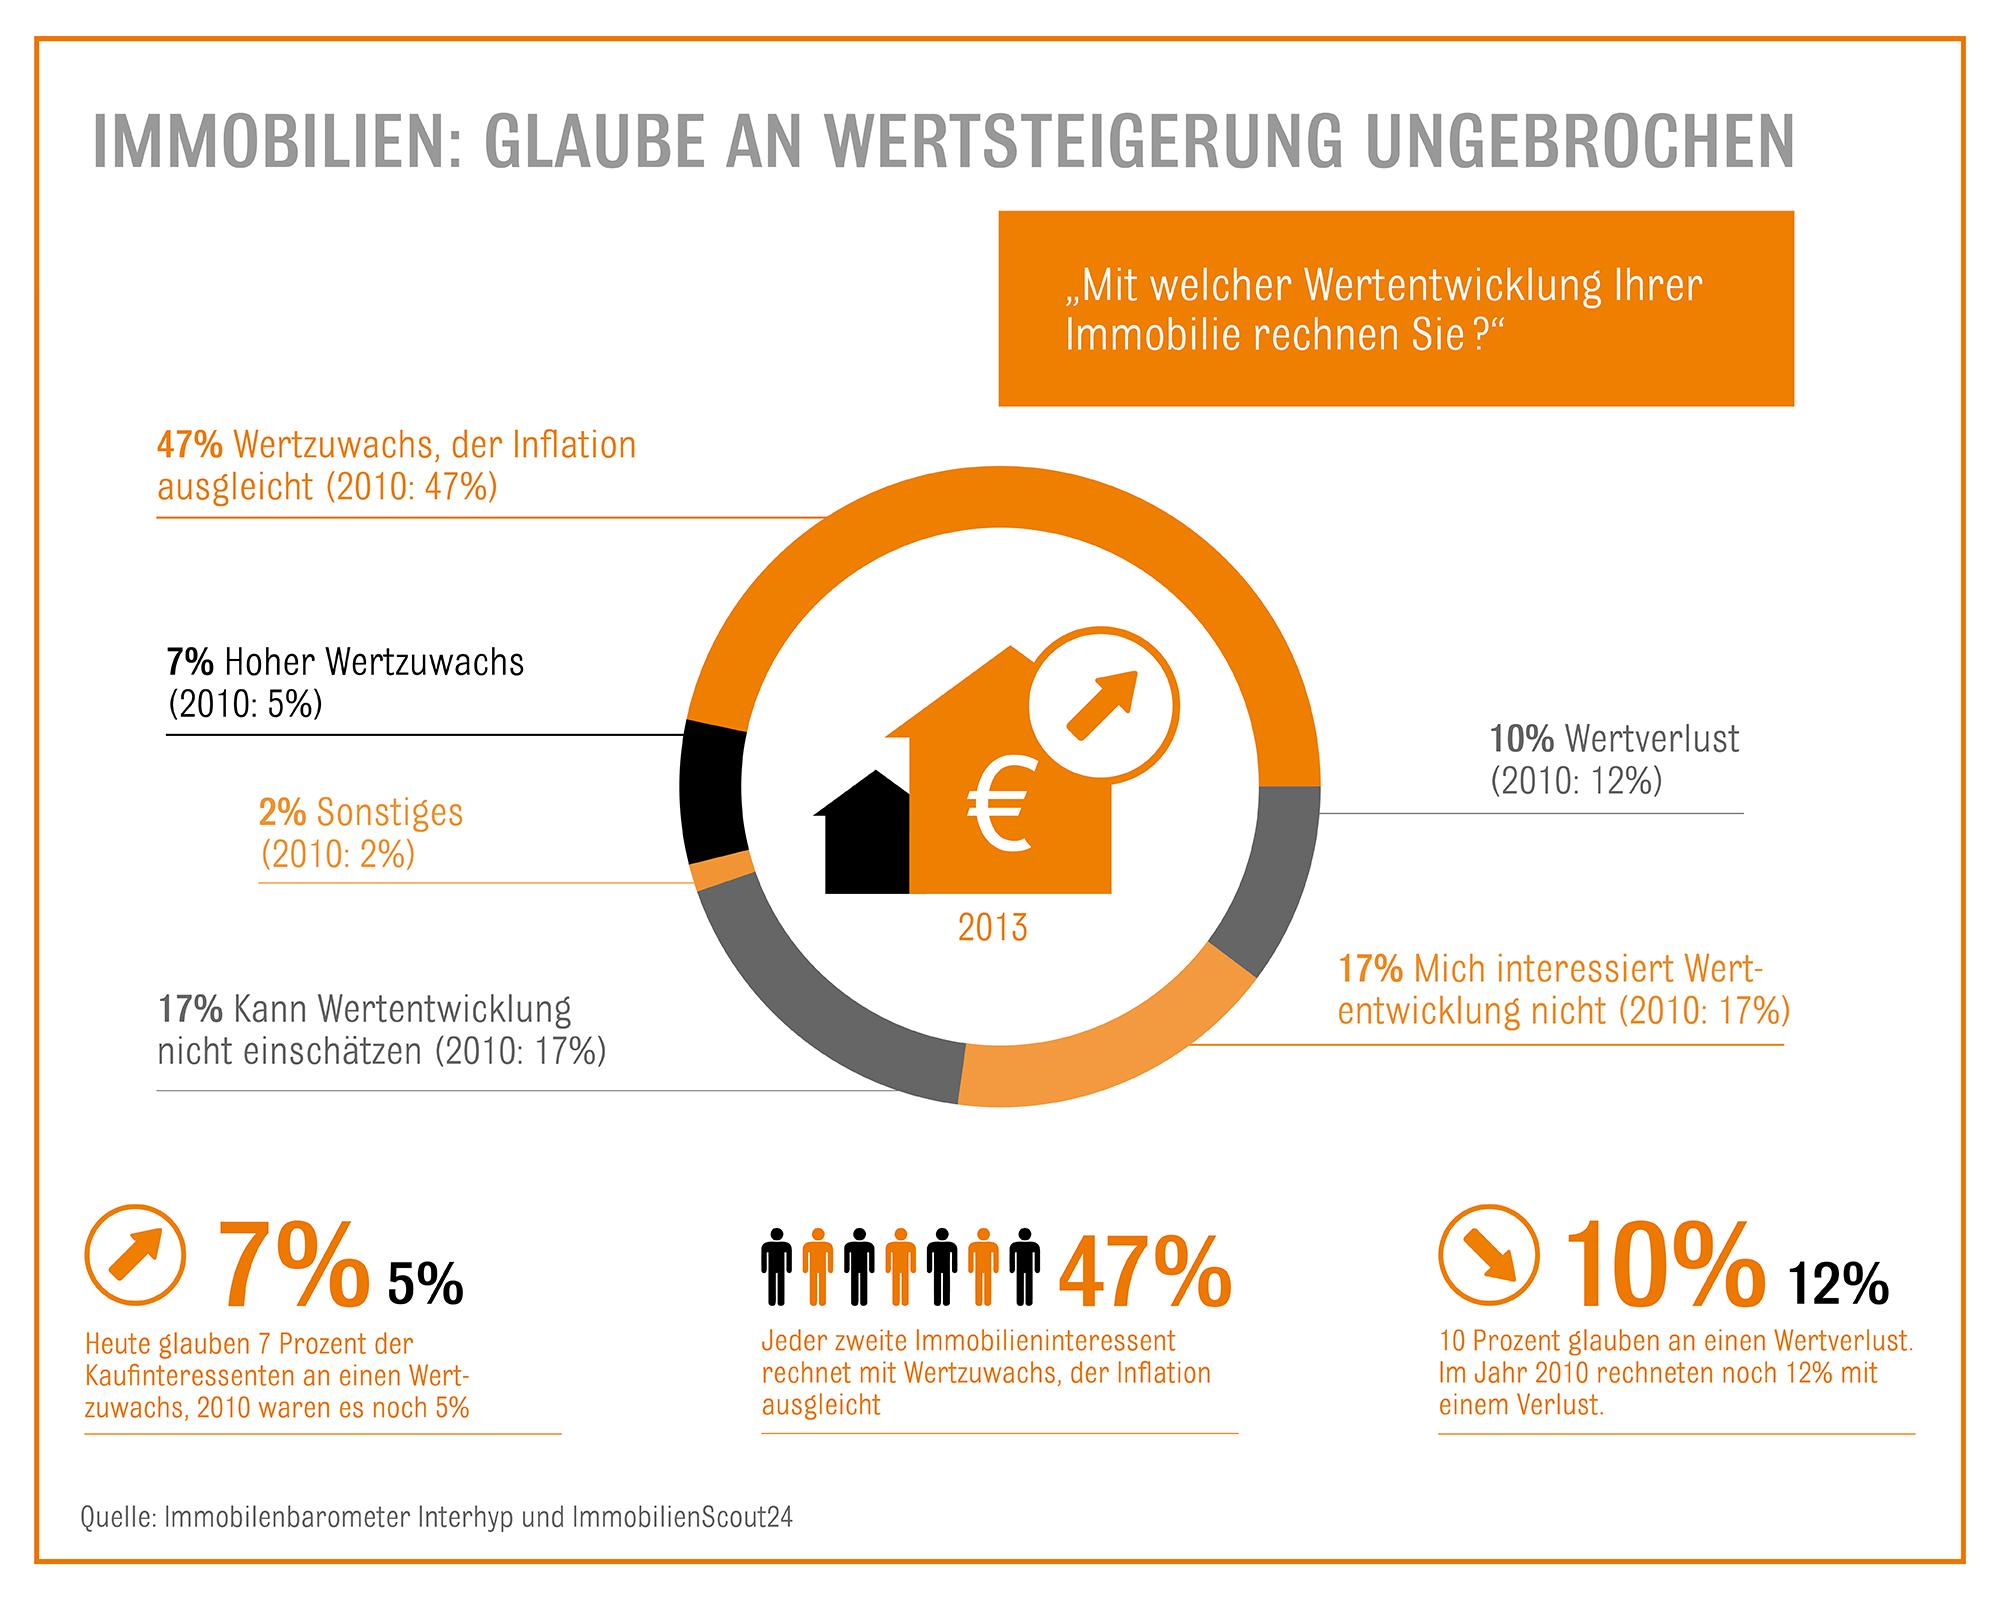 Immobilienpreise Ulm immobilienbarometer trotz hoher immobilienpreise ist glaube an